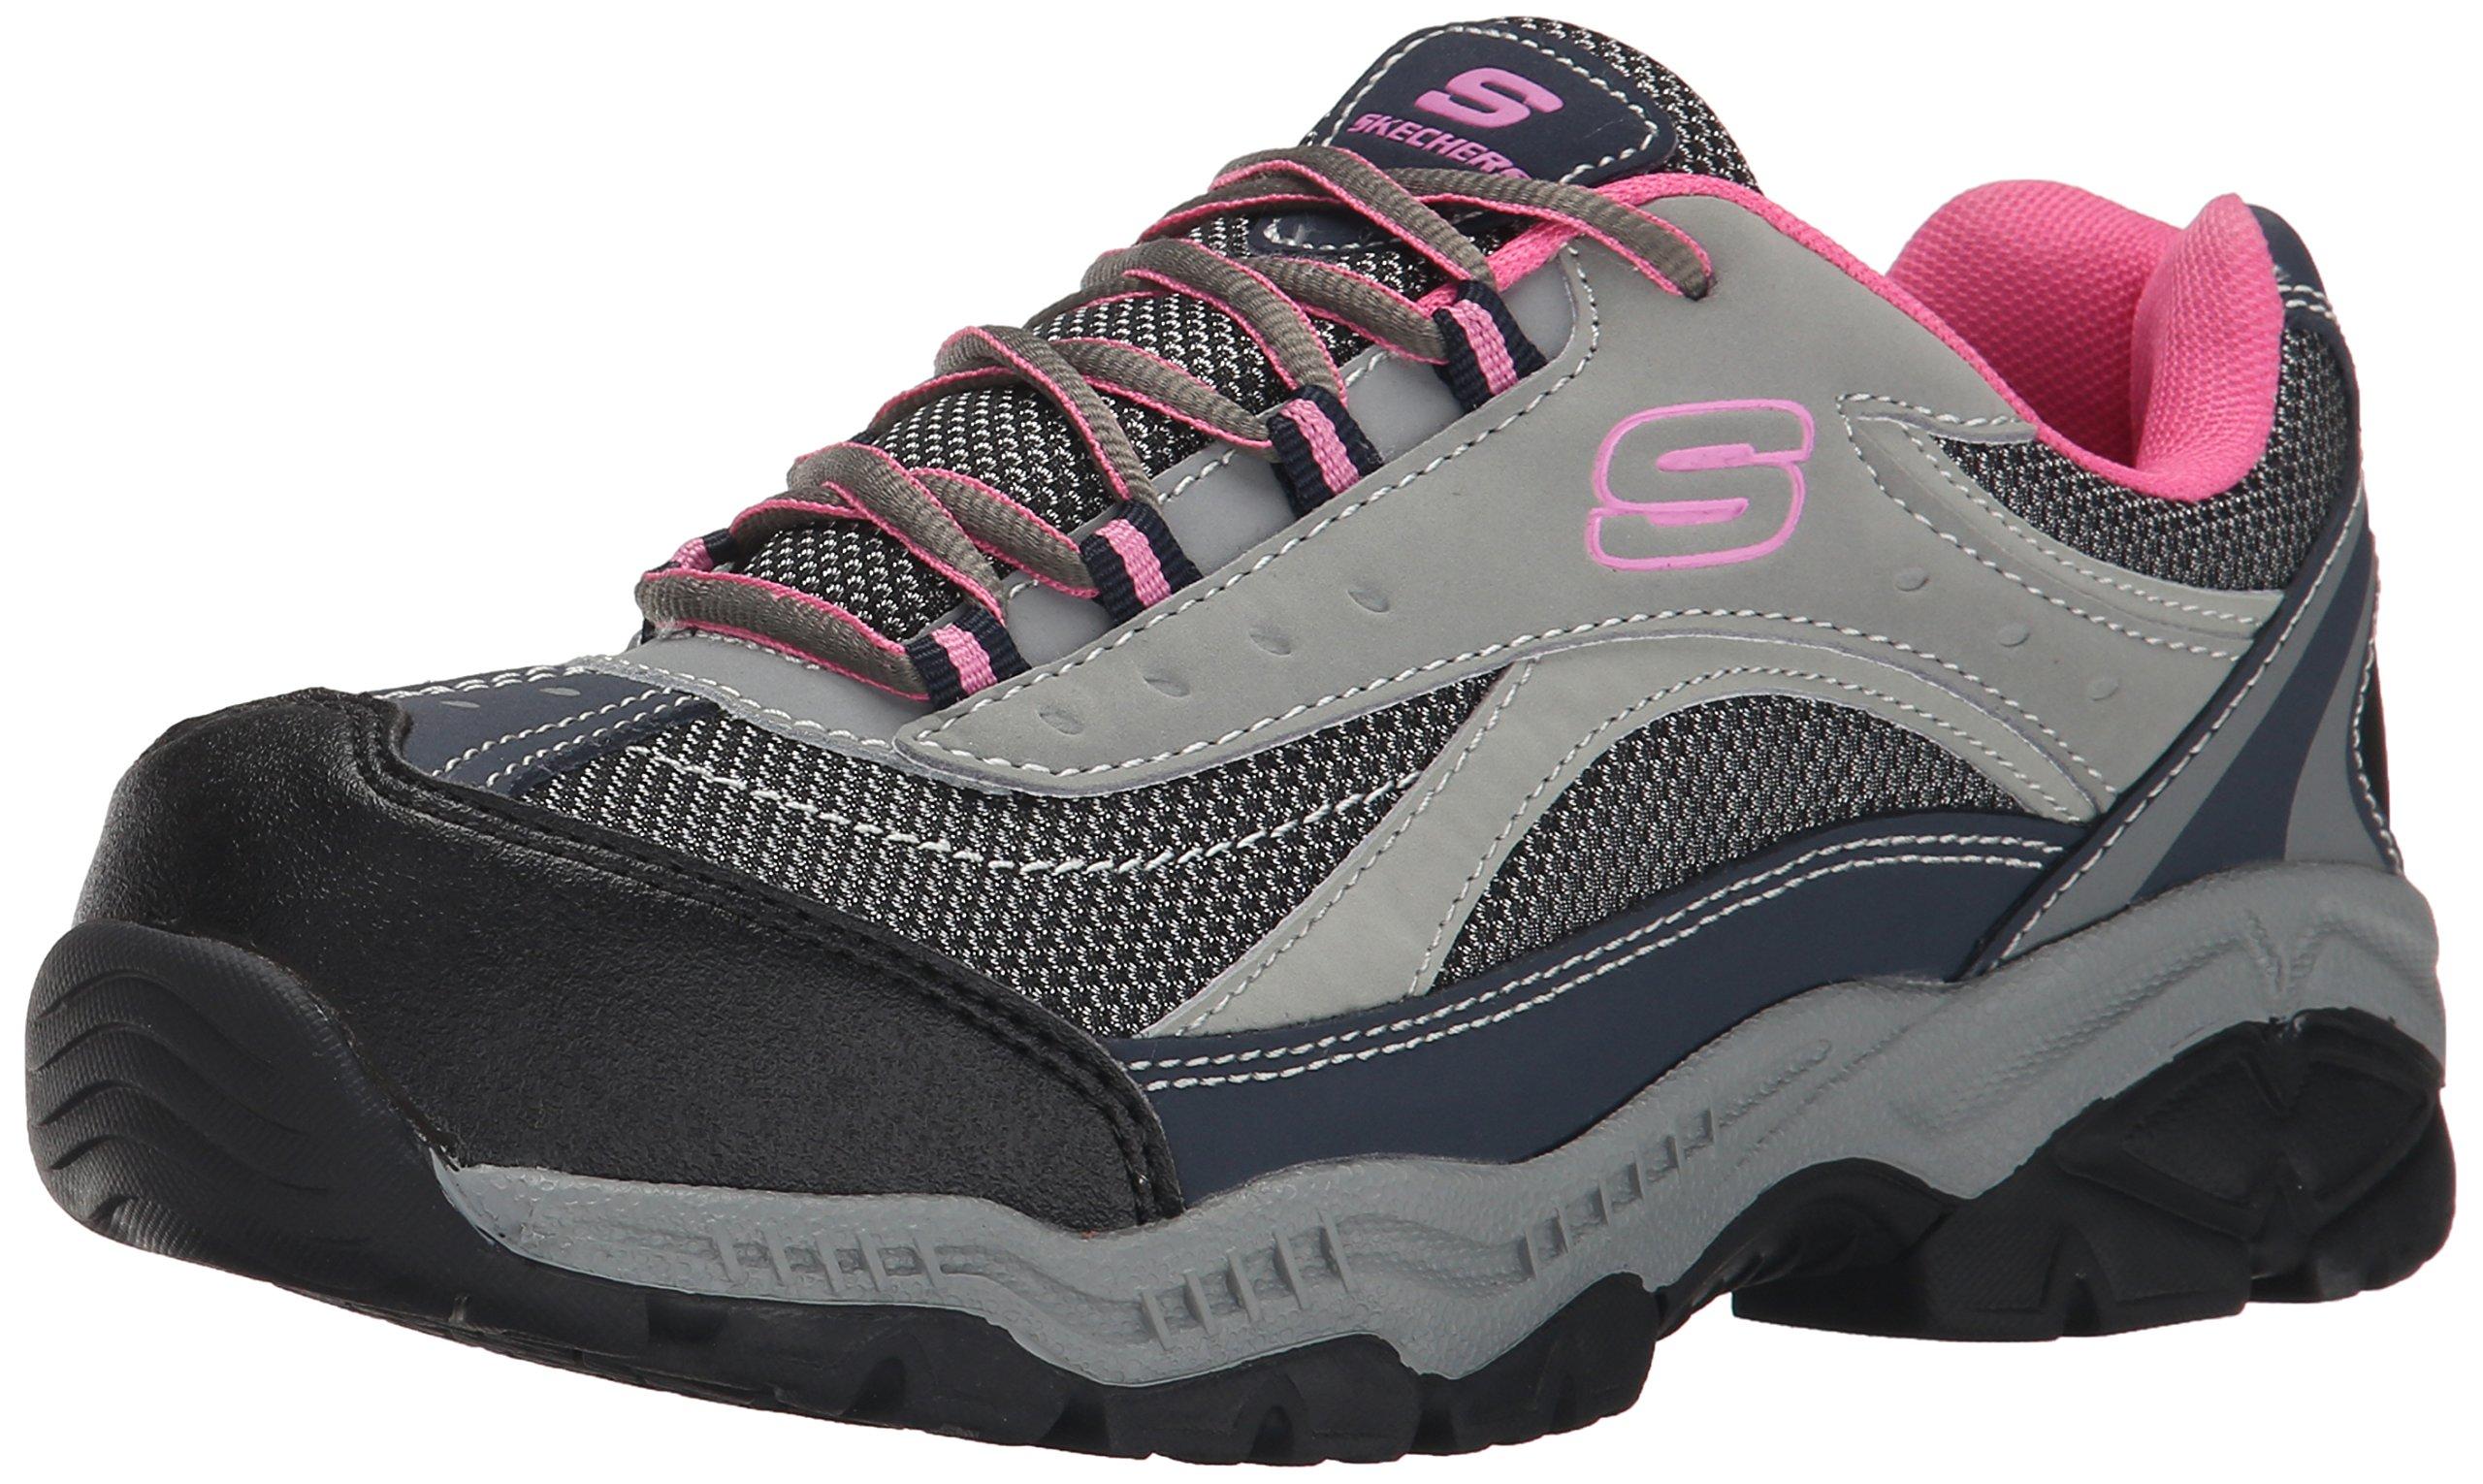 Skechers for Work Women's Doyline Hiker Boot, Gray Pink, 9 M US by Skechers (Image #1)